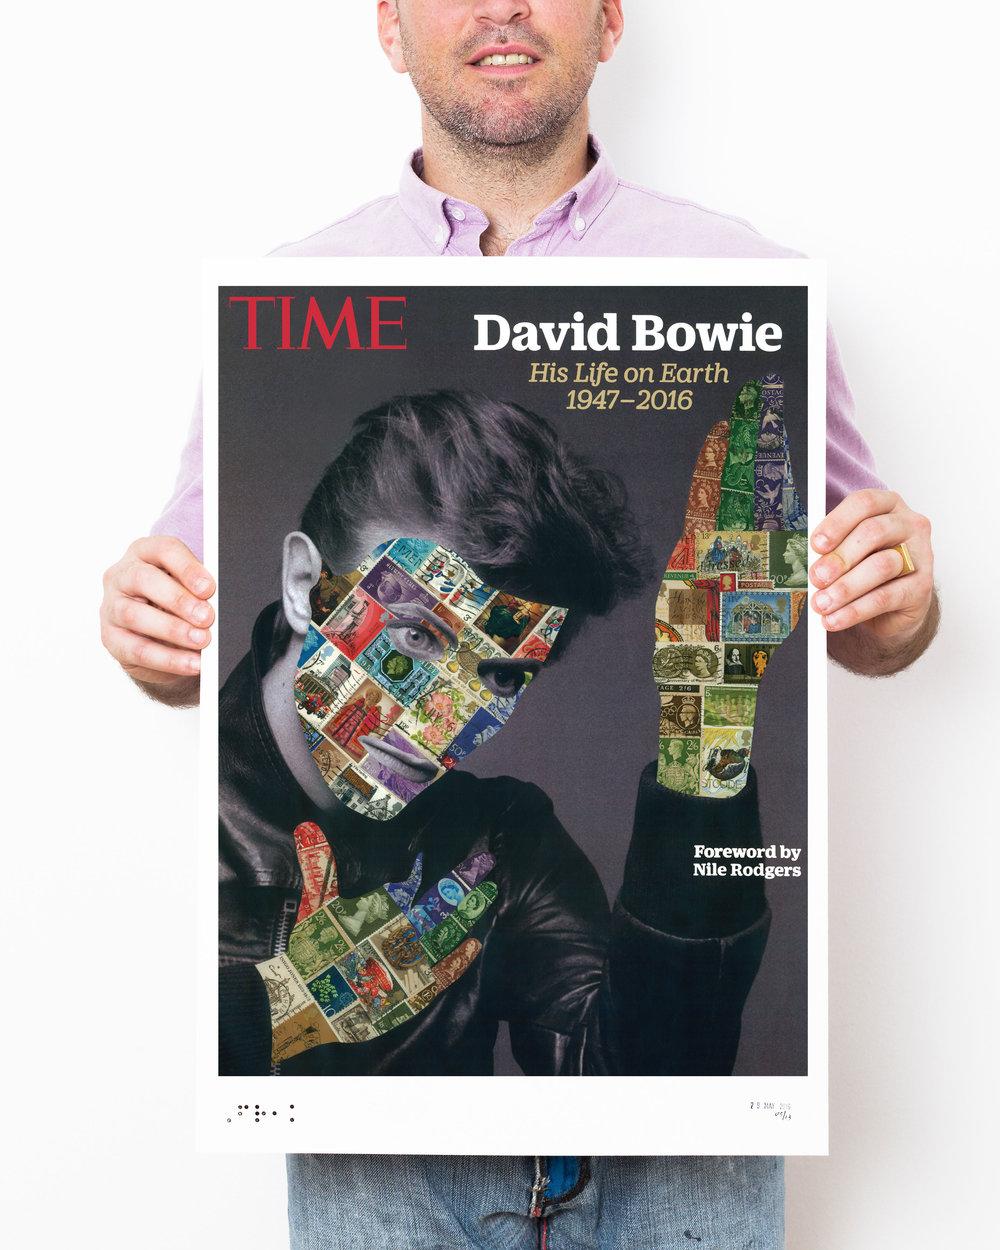 luigi-rodriguez-david-bowie-time-magazine.jpg